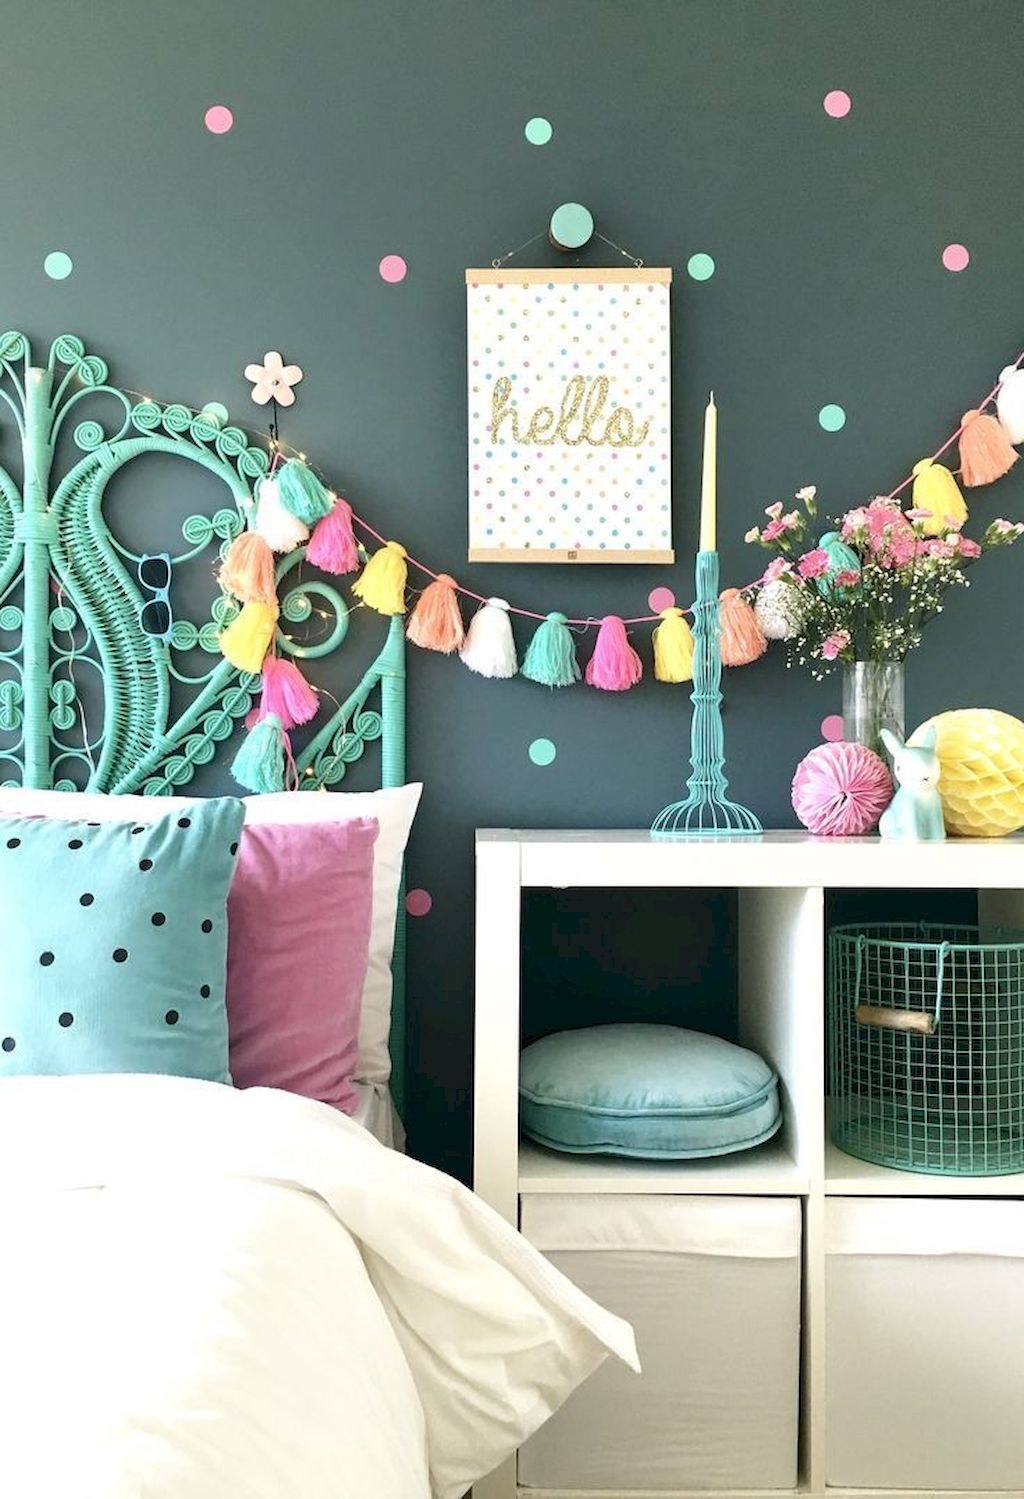 29 Sipmle But Amazing Diy Summer Ideas Room Decor Roomdecor